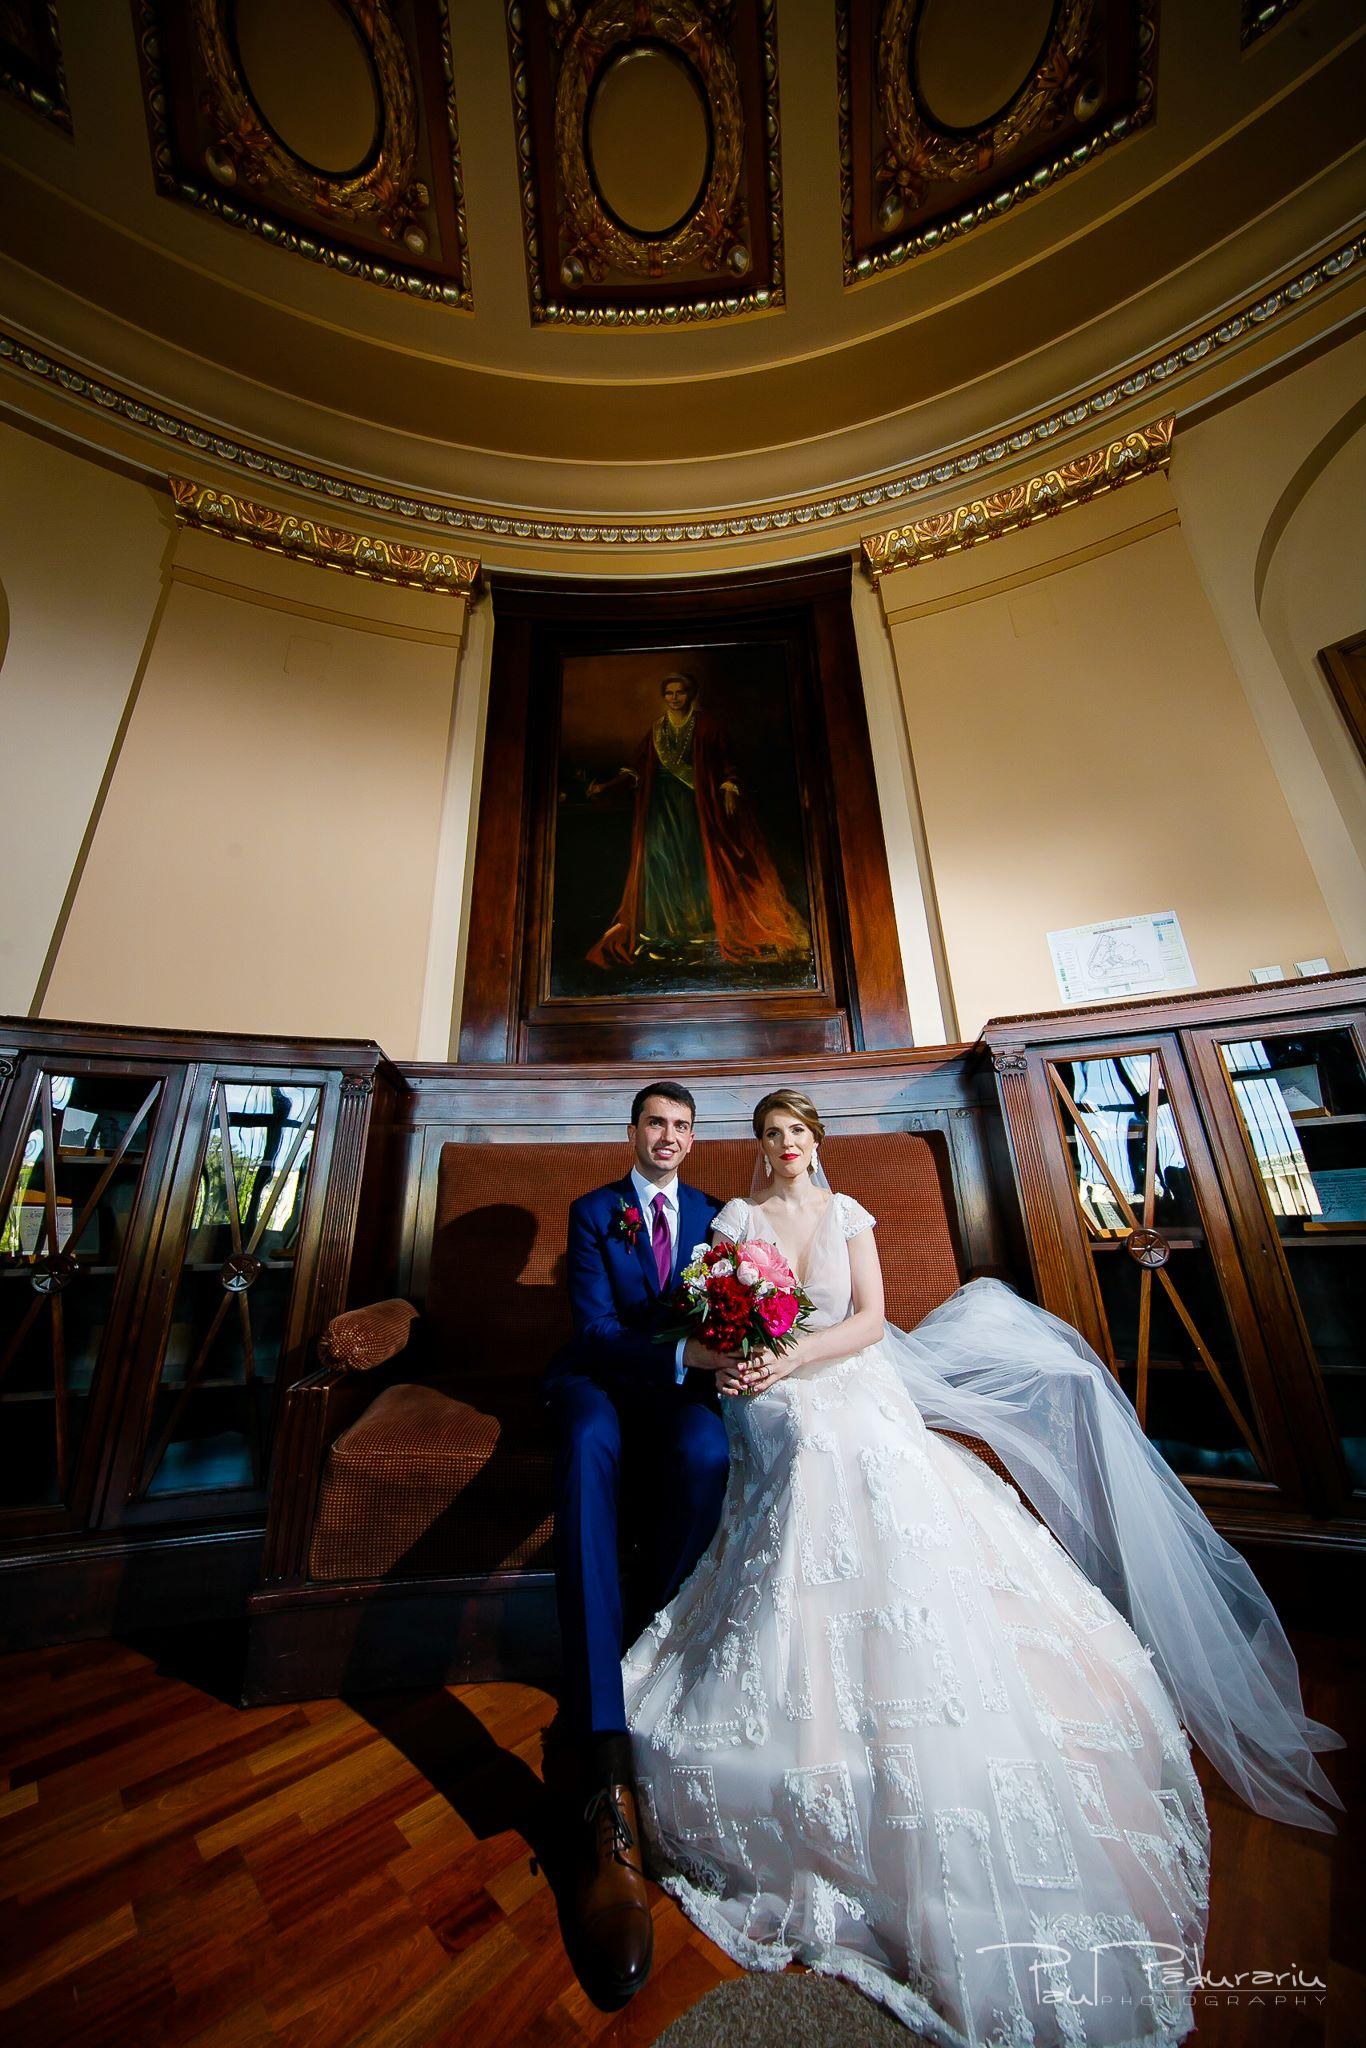 Madalina si Ionut - nunta Congress Hall | fotograf nunta iasi paul padurariu same day edit 2019 5